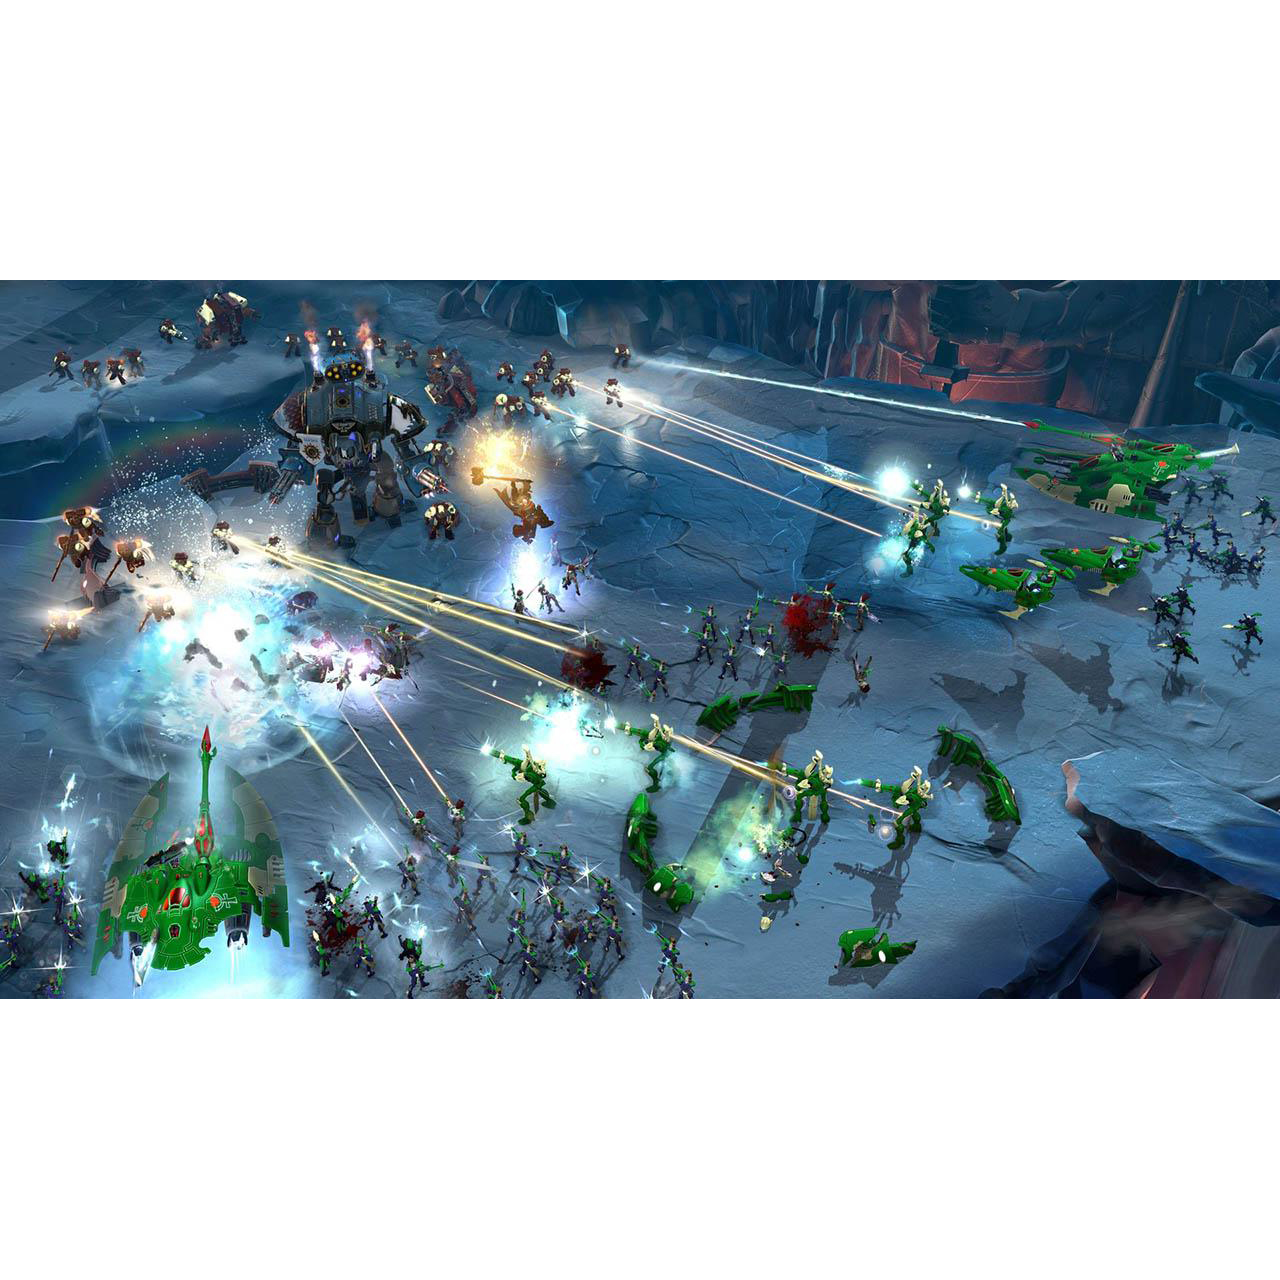 Joc Dawn of War 3 pentru PC 5